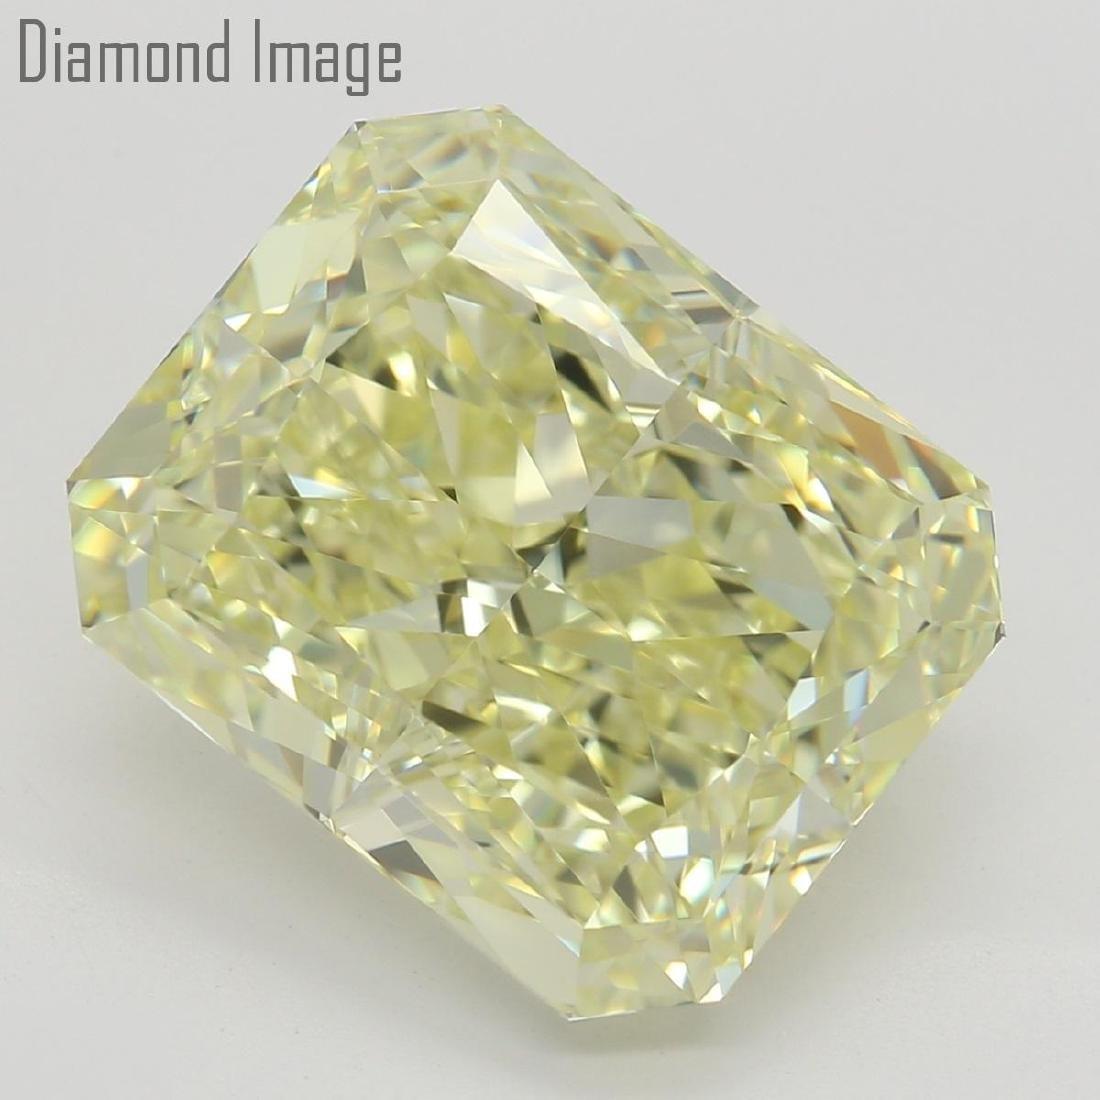 6.01 ct, Natural Color/VS1, Radiant cut Diamond